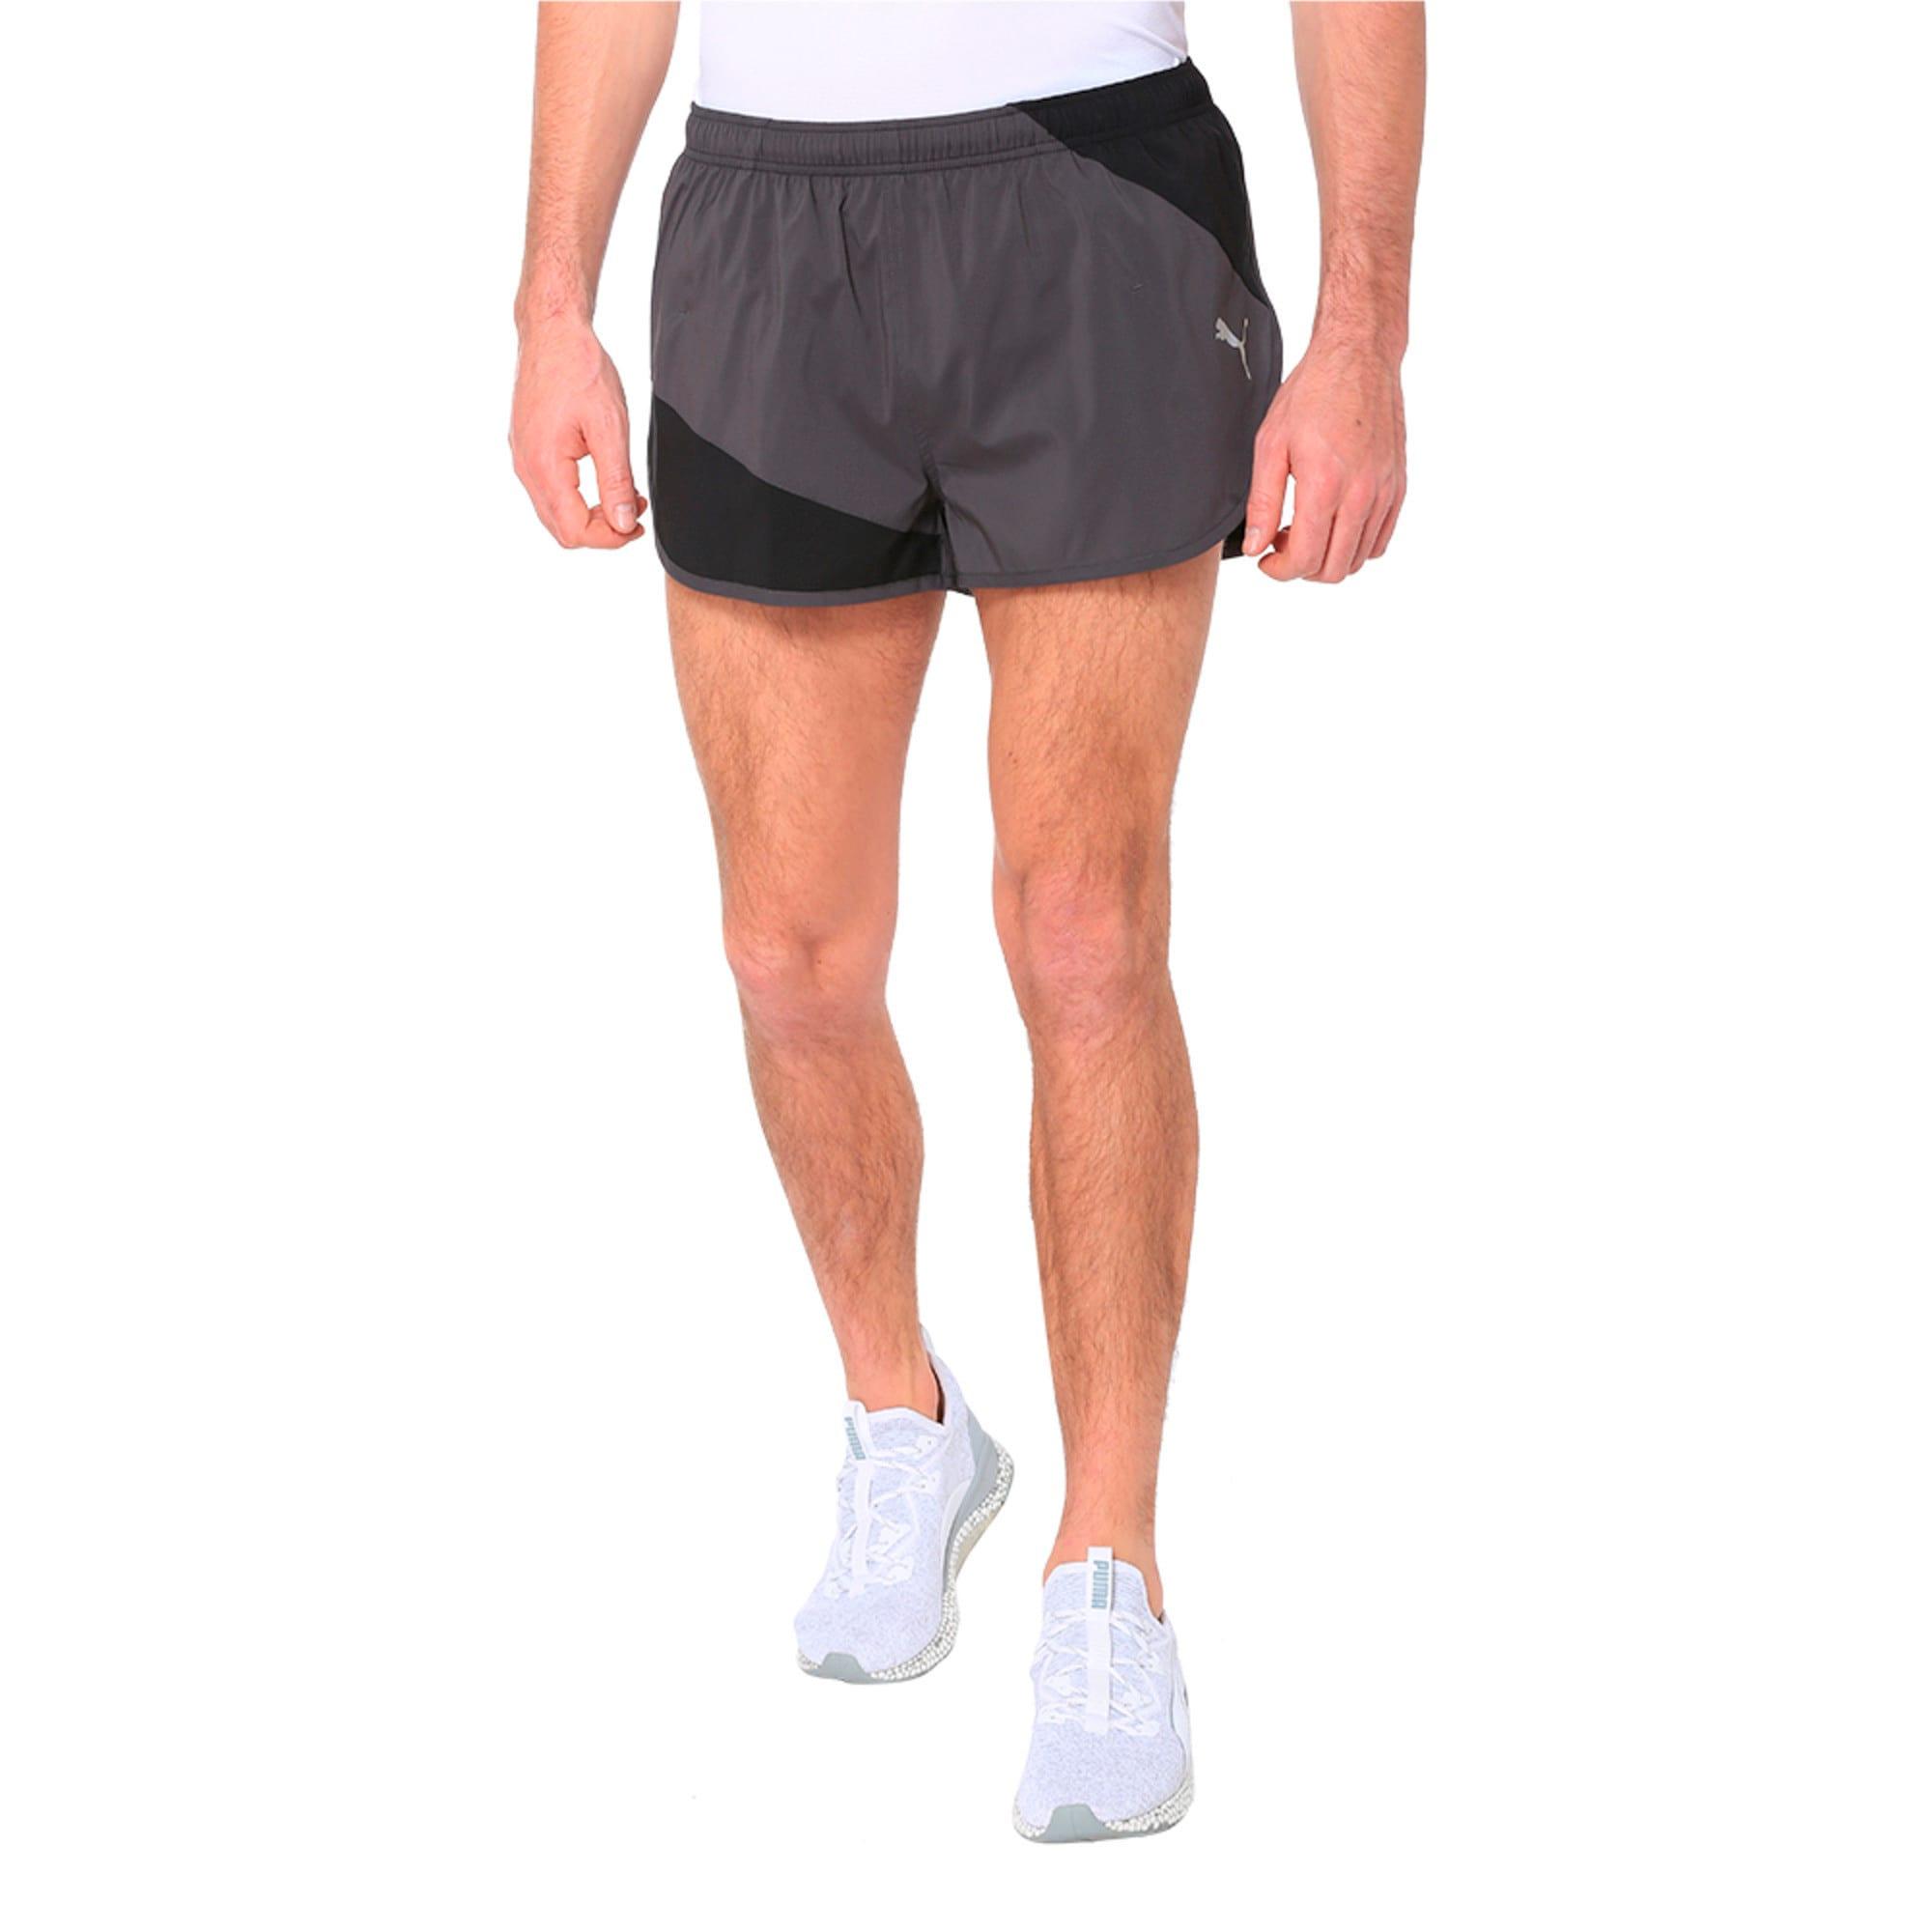 Thumbnail 1 of IGNITE Men's Running Split Shorts, Puma Black-Asphalt, medium-IND